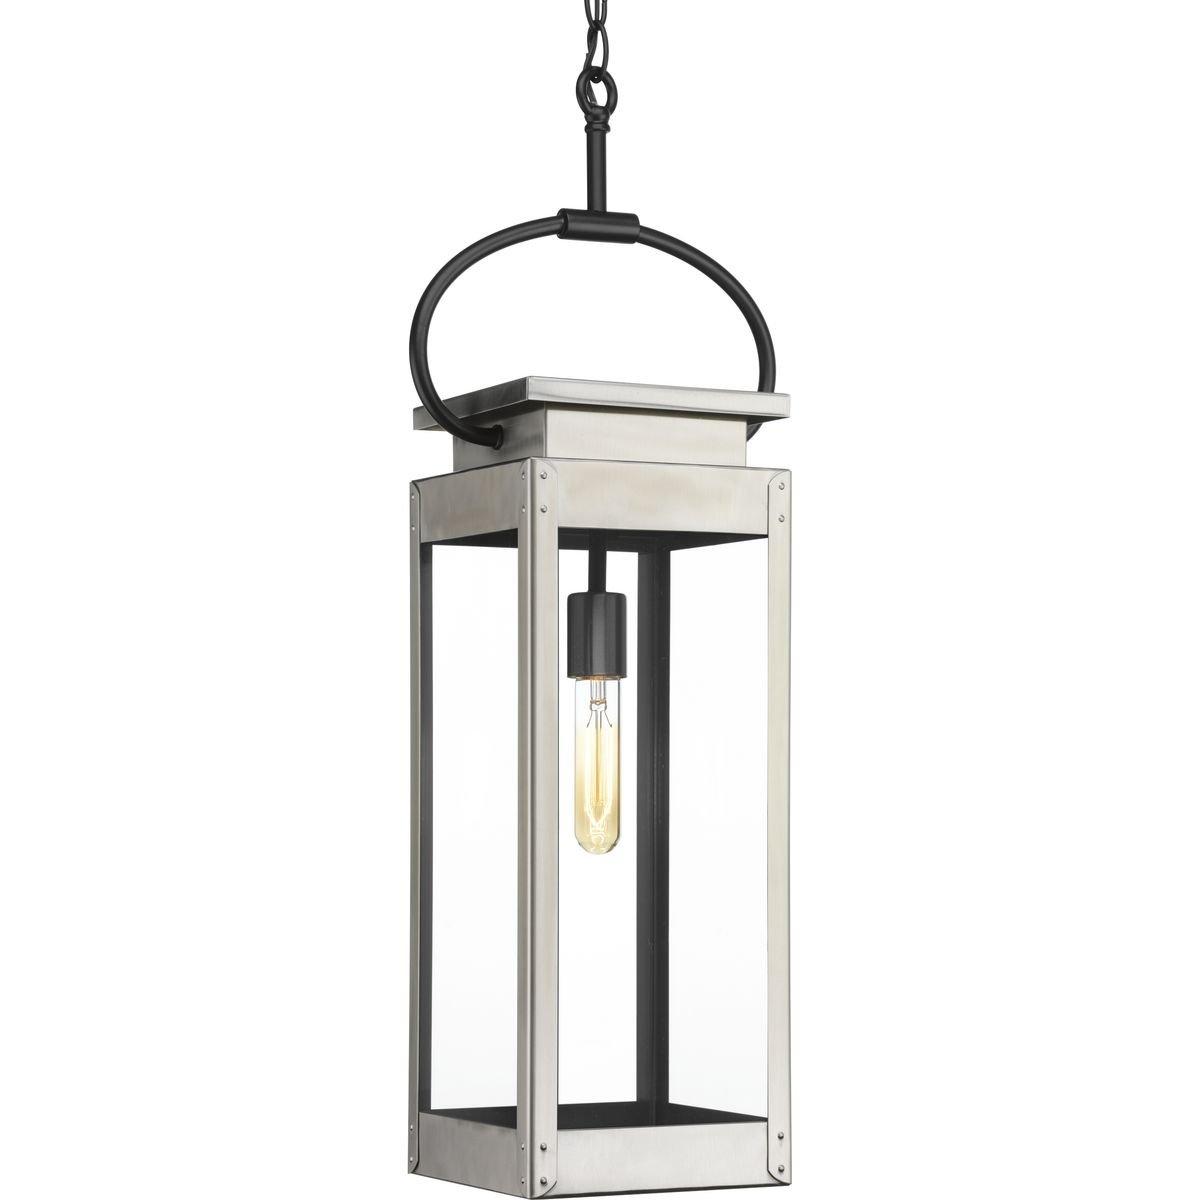 Progress Lighting P550018-135 Union Square One-Light Hanging Lantern, Stainless Steel